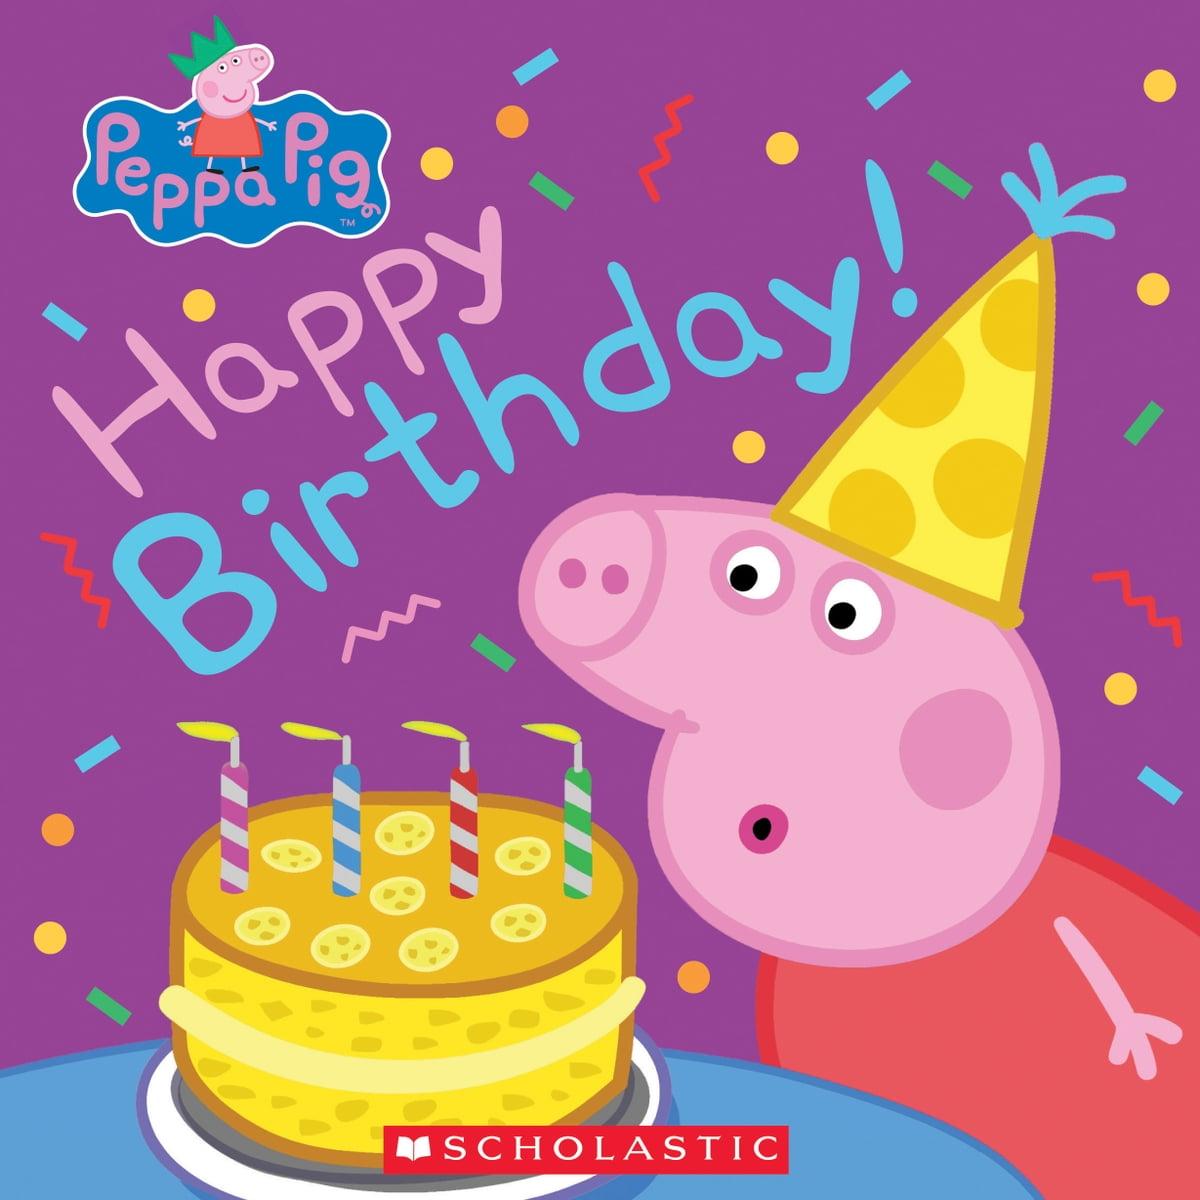 Happy Birthday Peppa Pig Ebook By Annie Auerbach 9781338335903 Rakuten Kobo United States